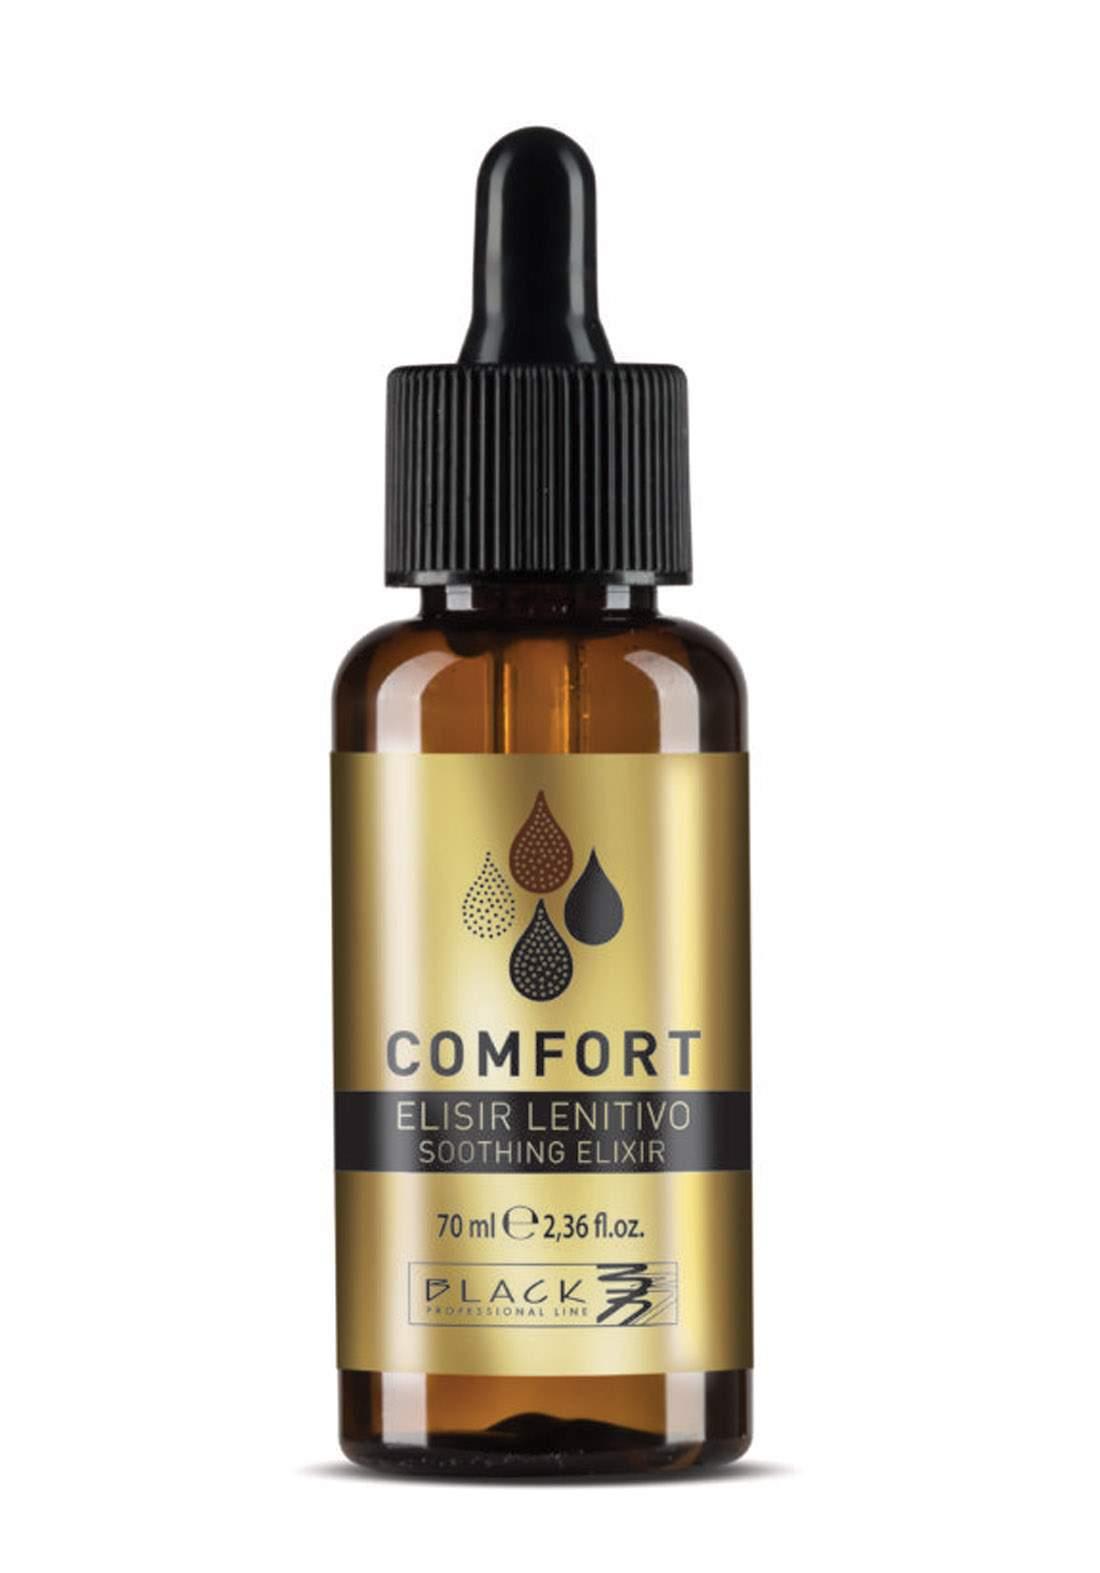 Black Professional Comfort Soothing Dermo Protective Elixir Serum 70ml سيروم العناية